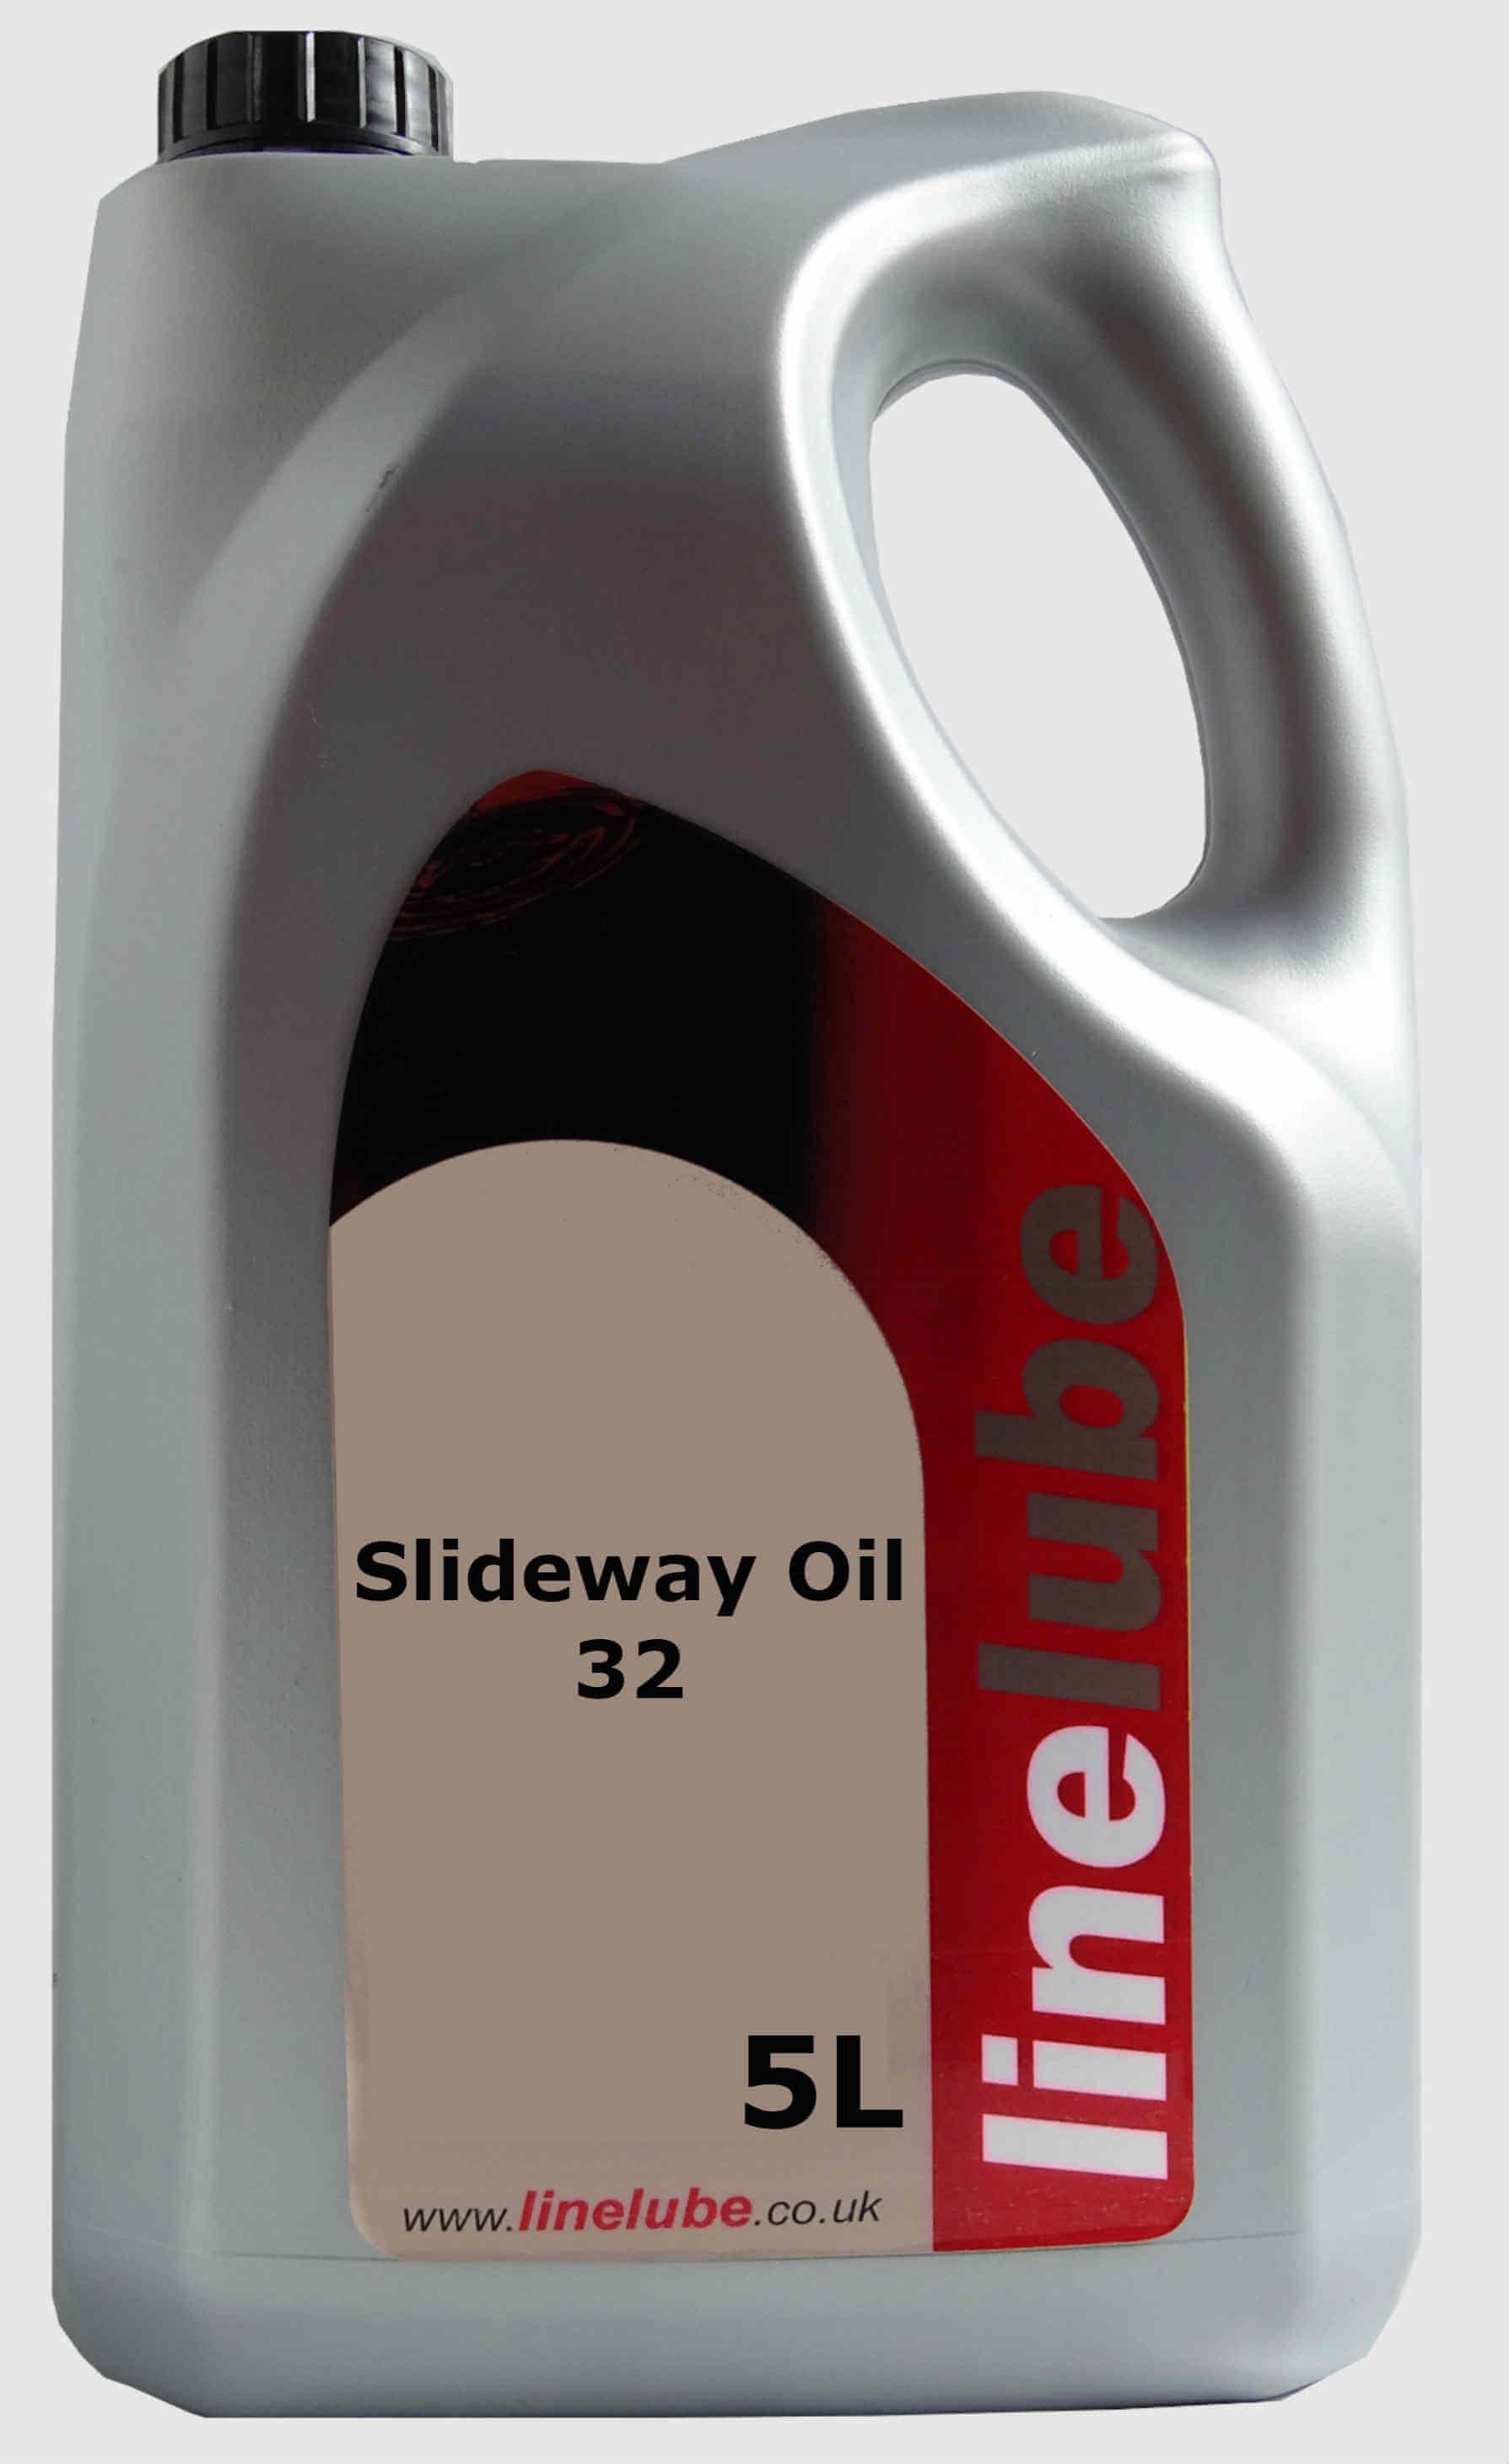 Linelube Slideway Oil 32